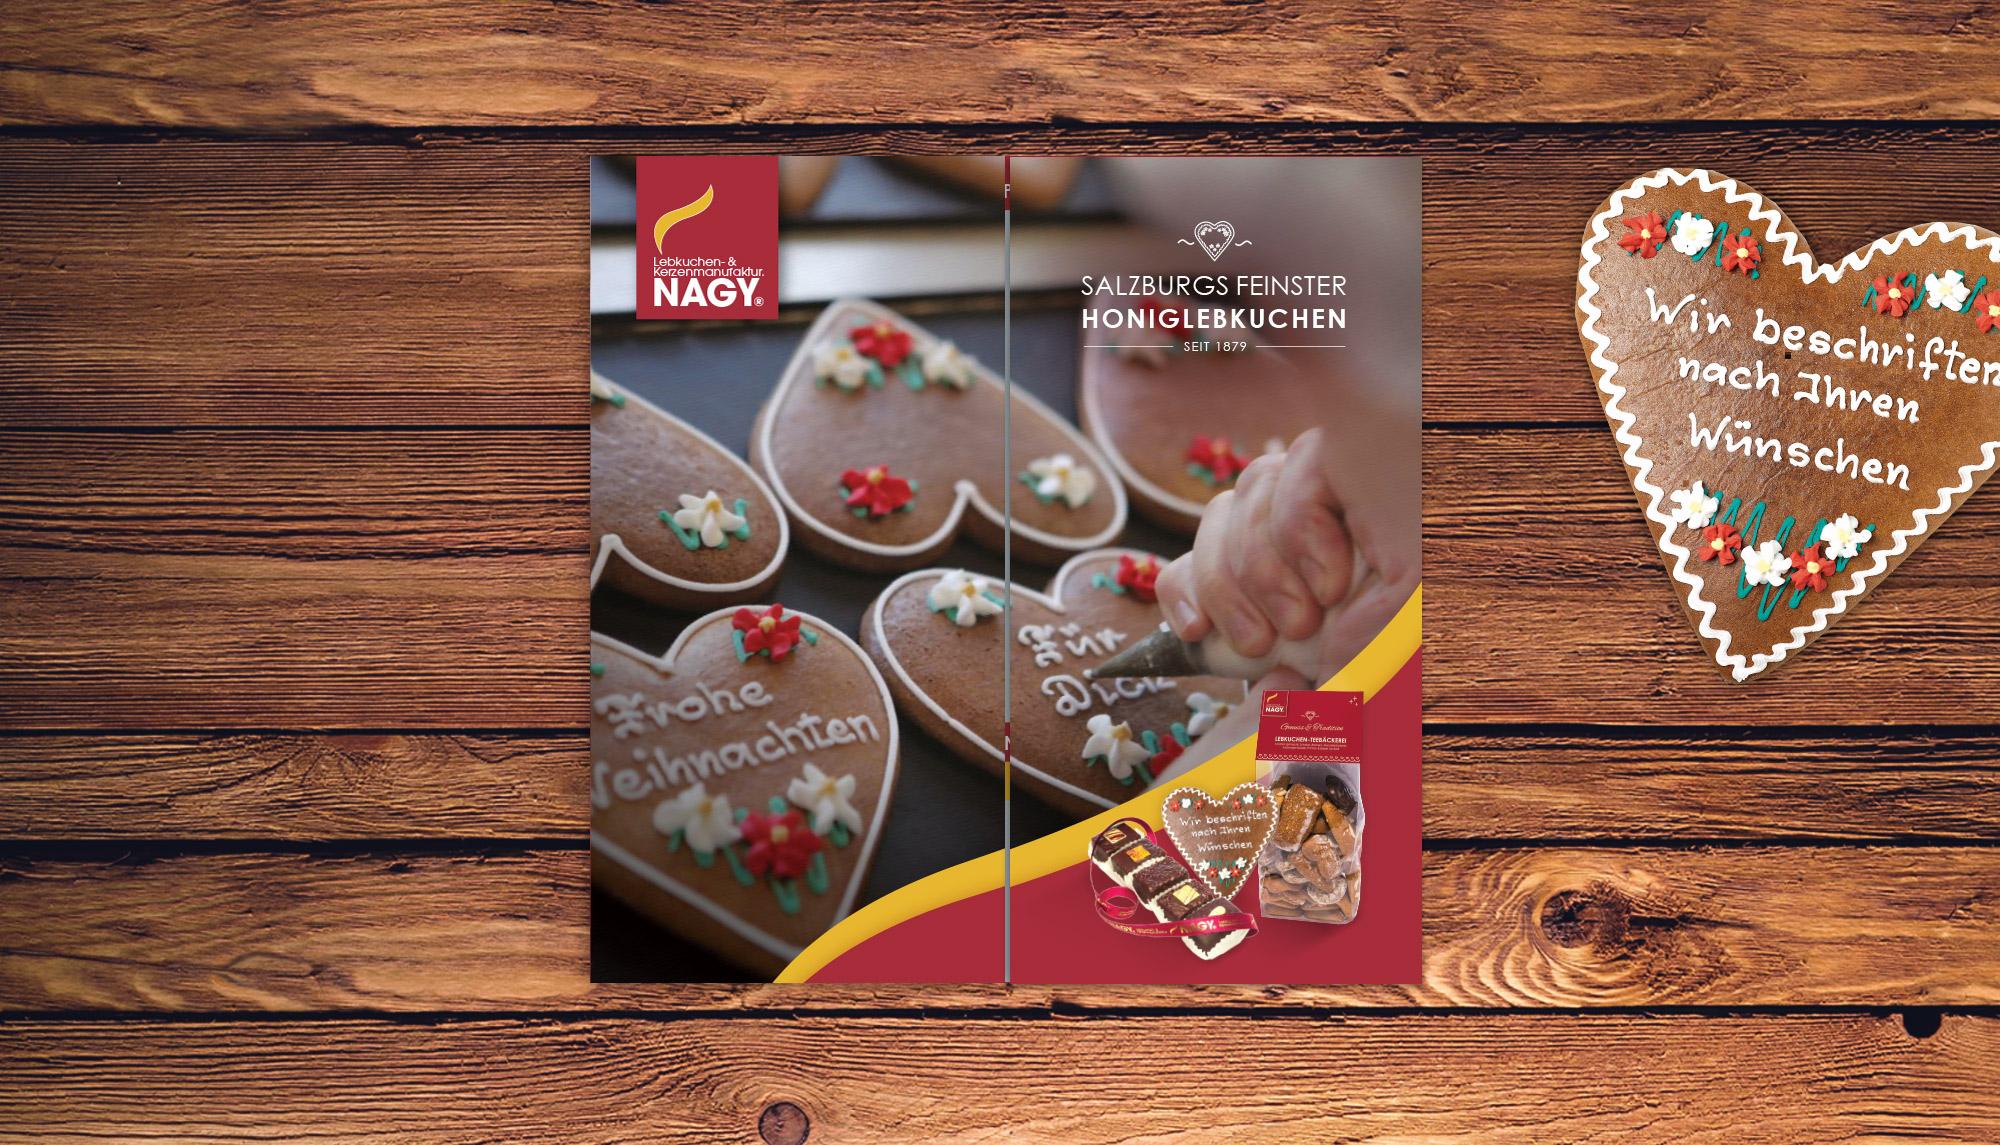 Lebkuchen - und Kerzenmanufaktur NAGY